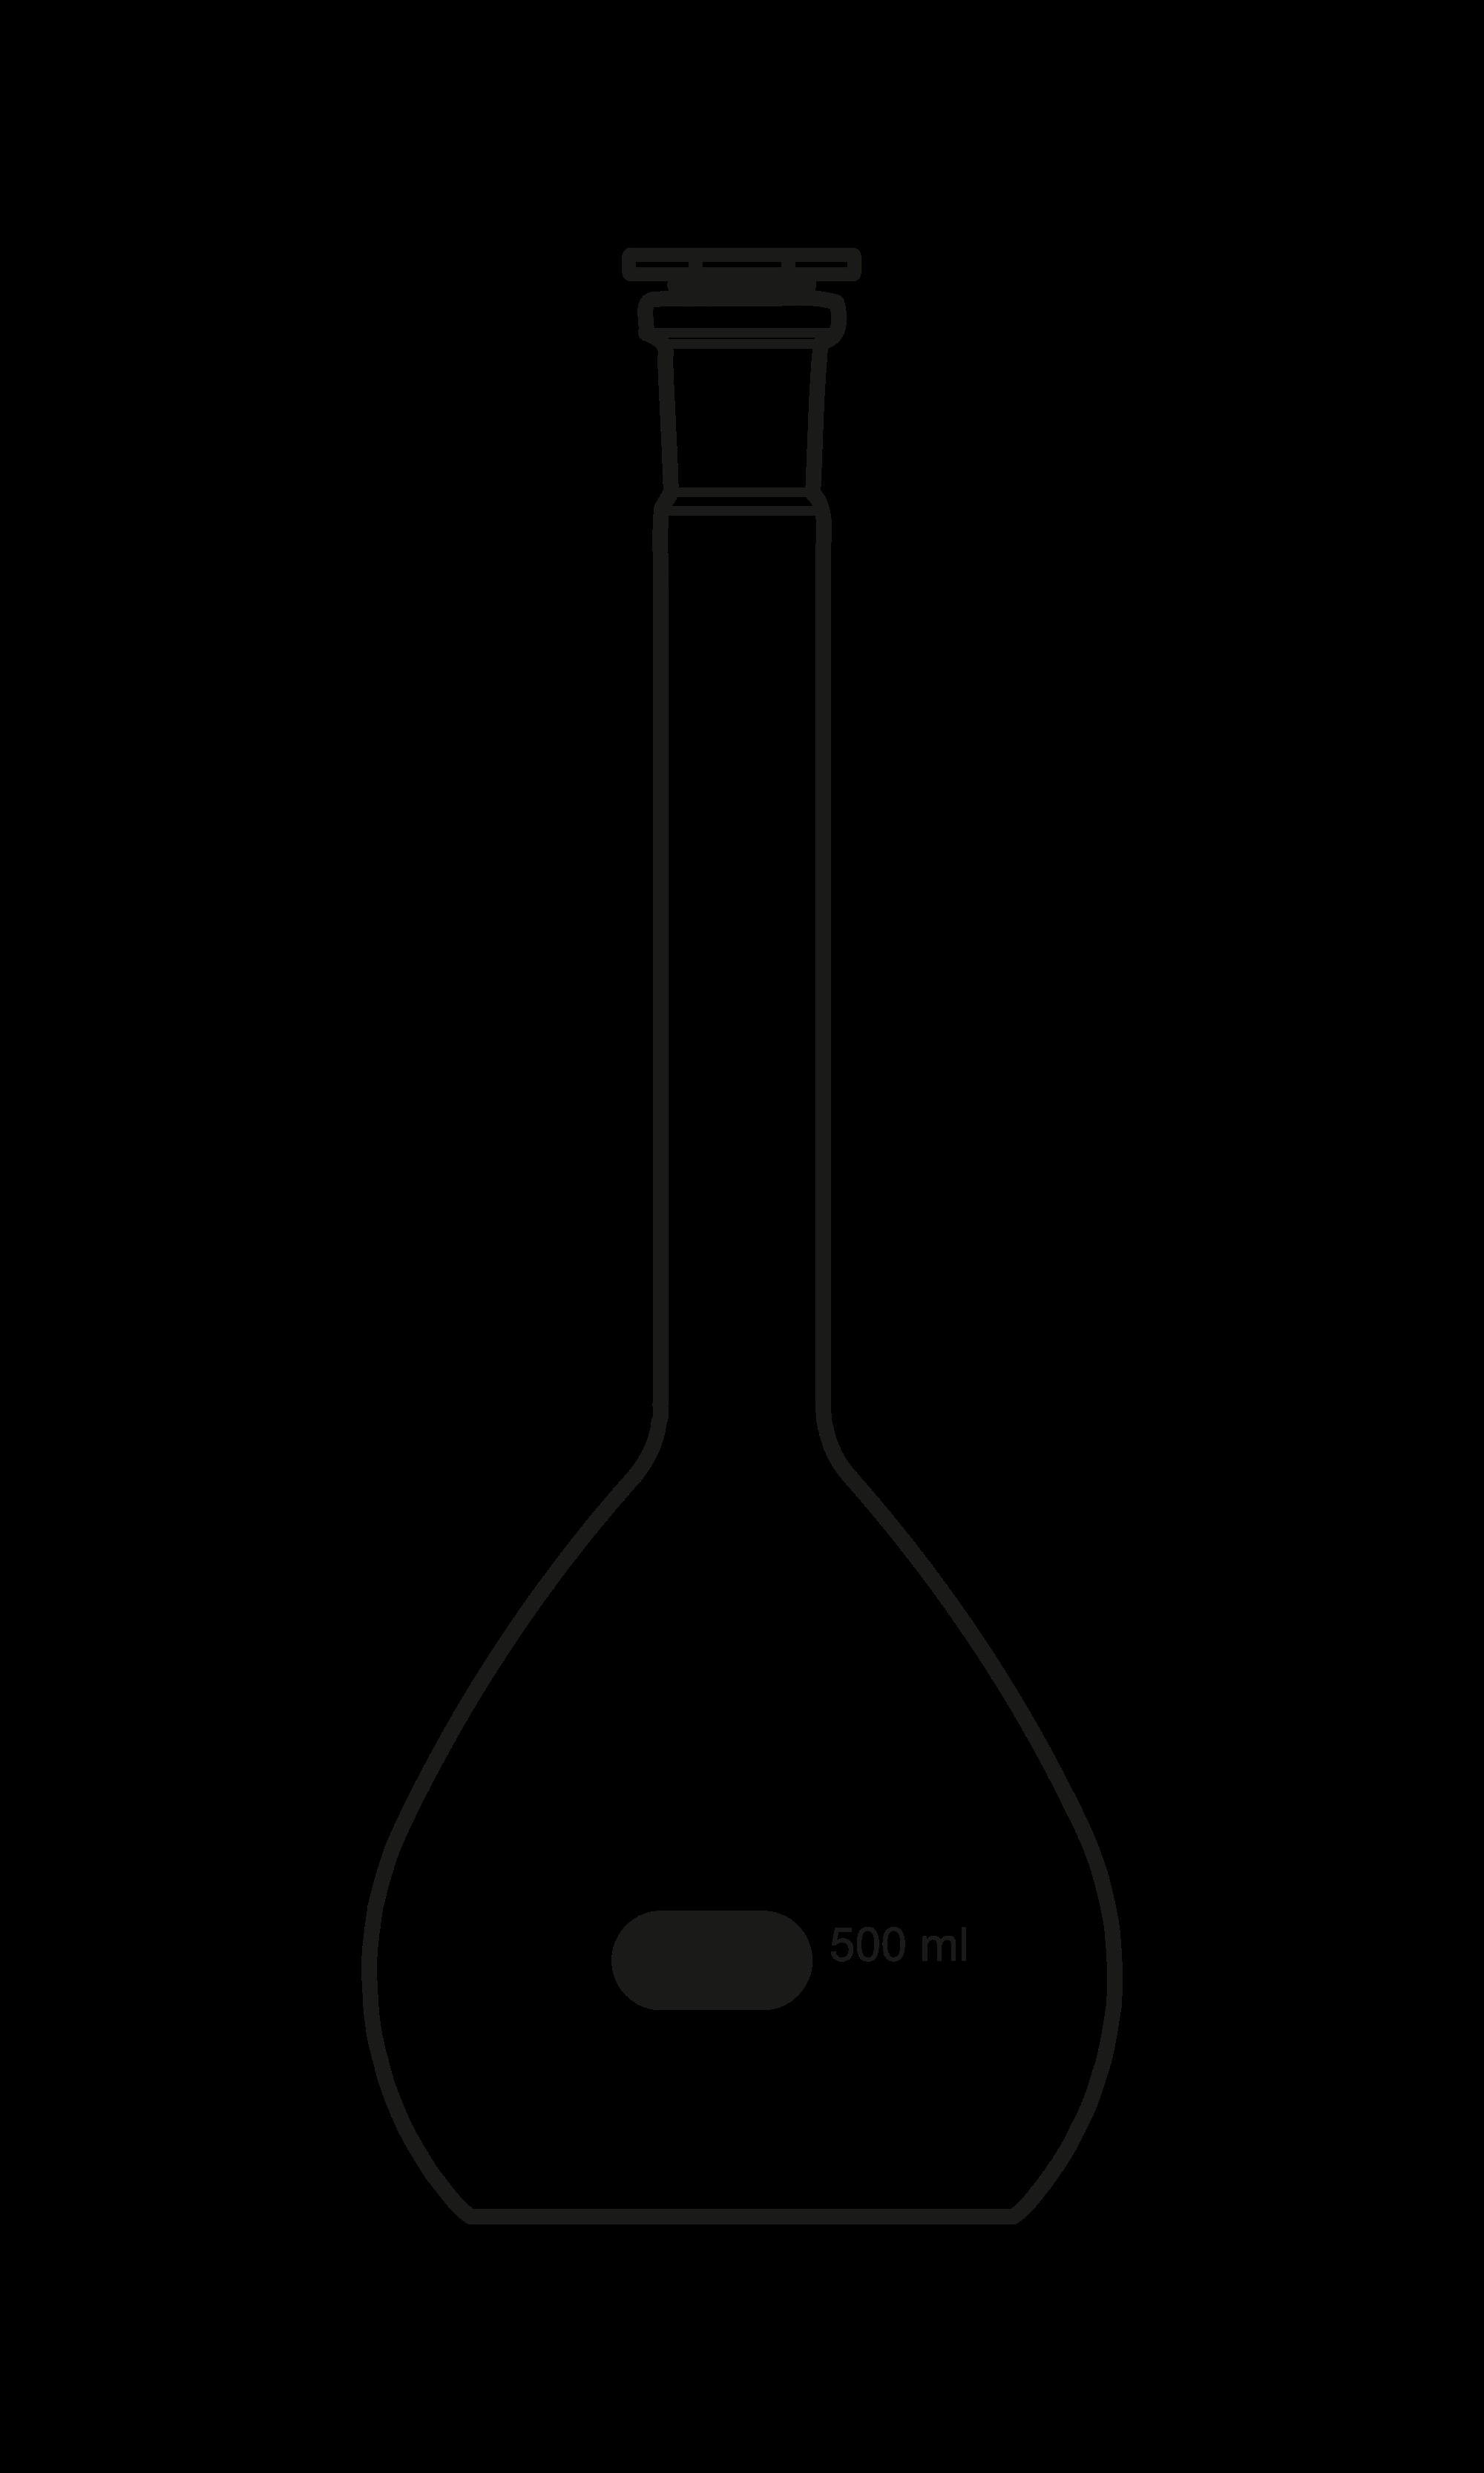 Erlenmeyer Flask PNG HD